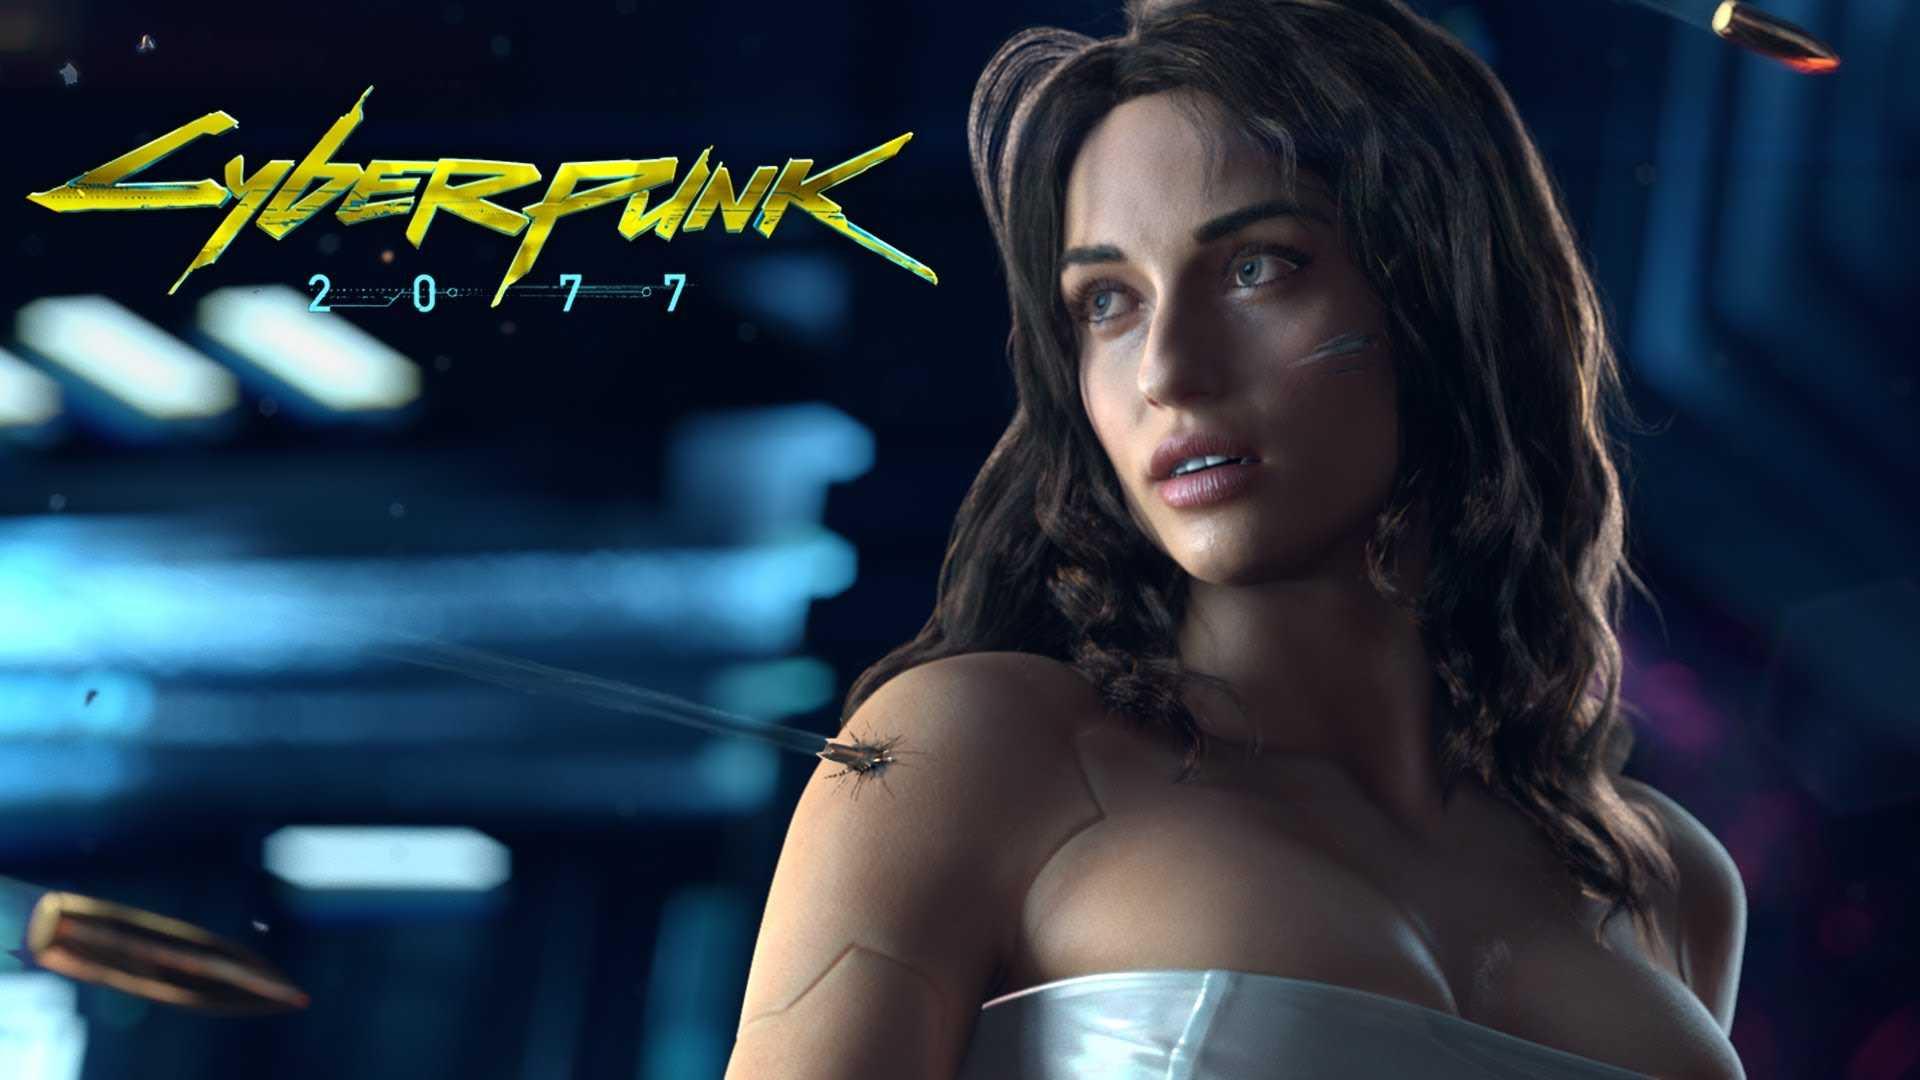 Купить Cyberpunk 2077 дешево